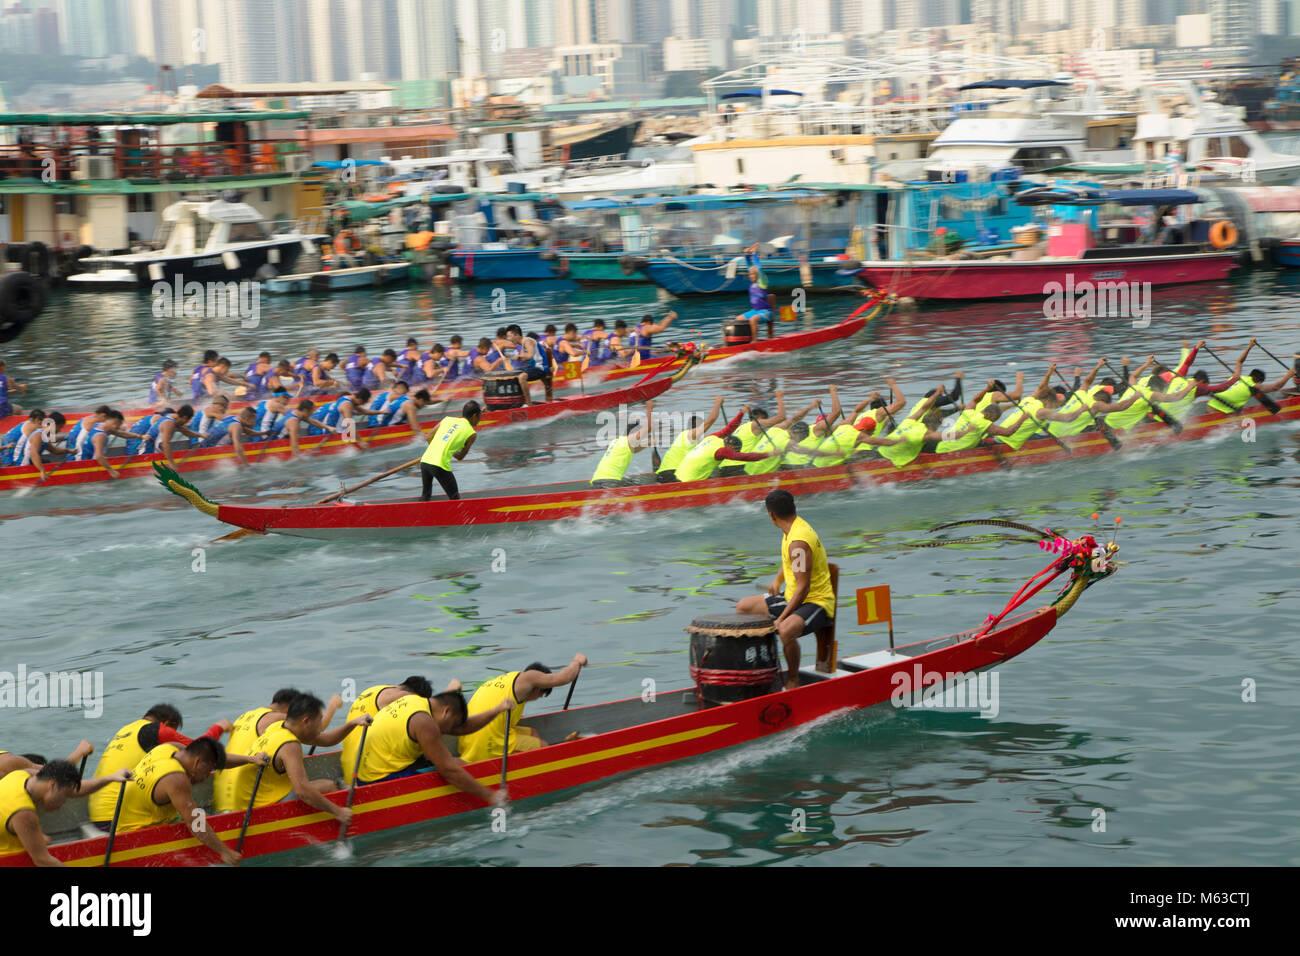 Drachenbootrennen, Shau Kei Wan, Hong Kong Island, Hong Kong, China Stockbild